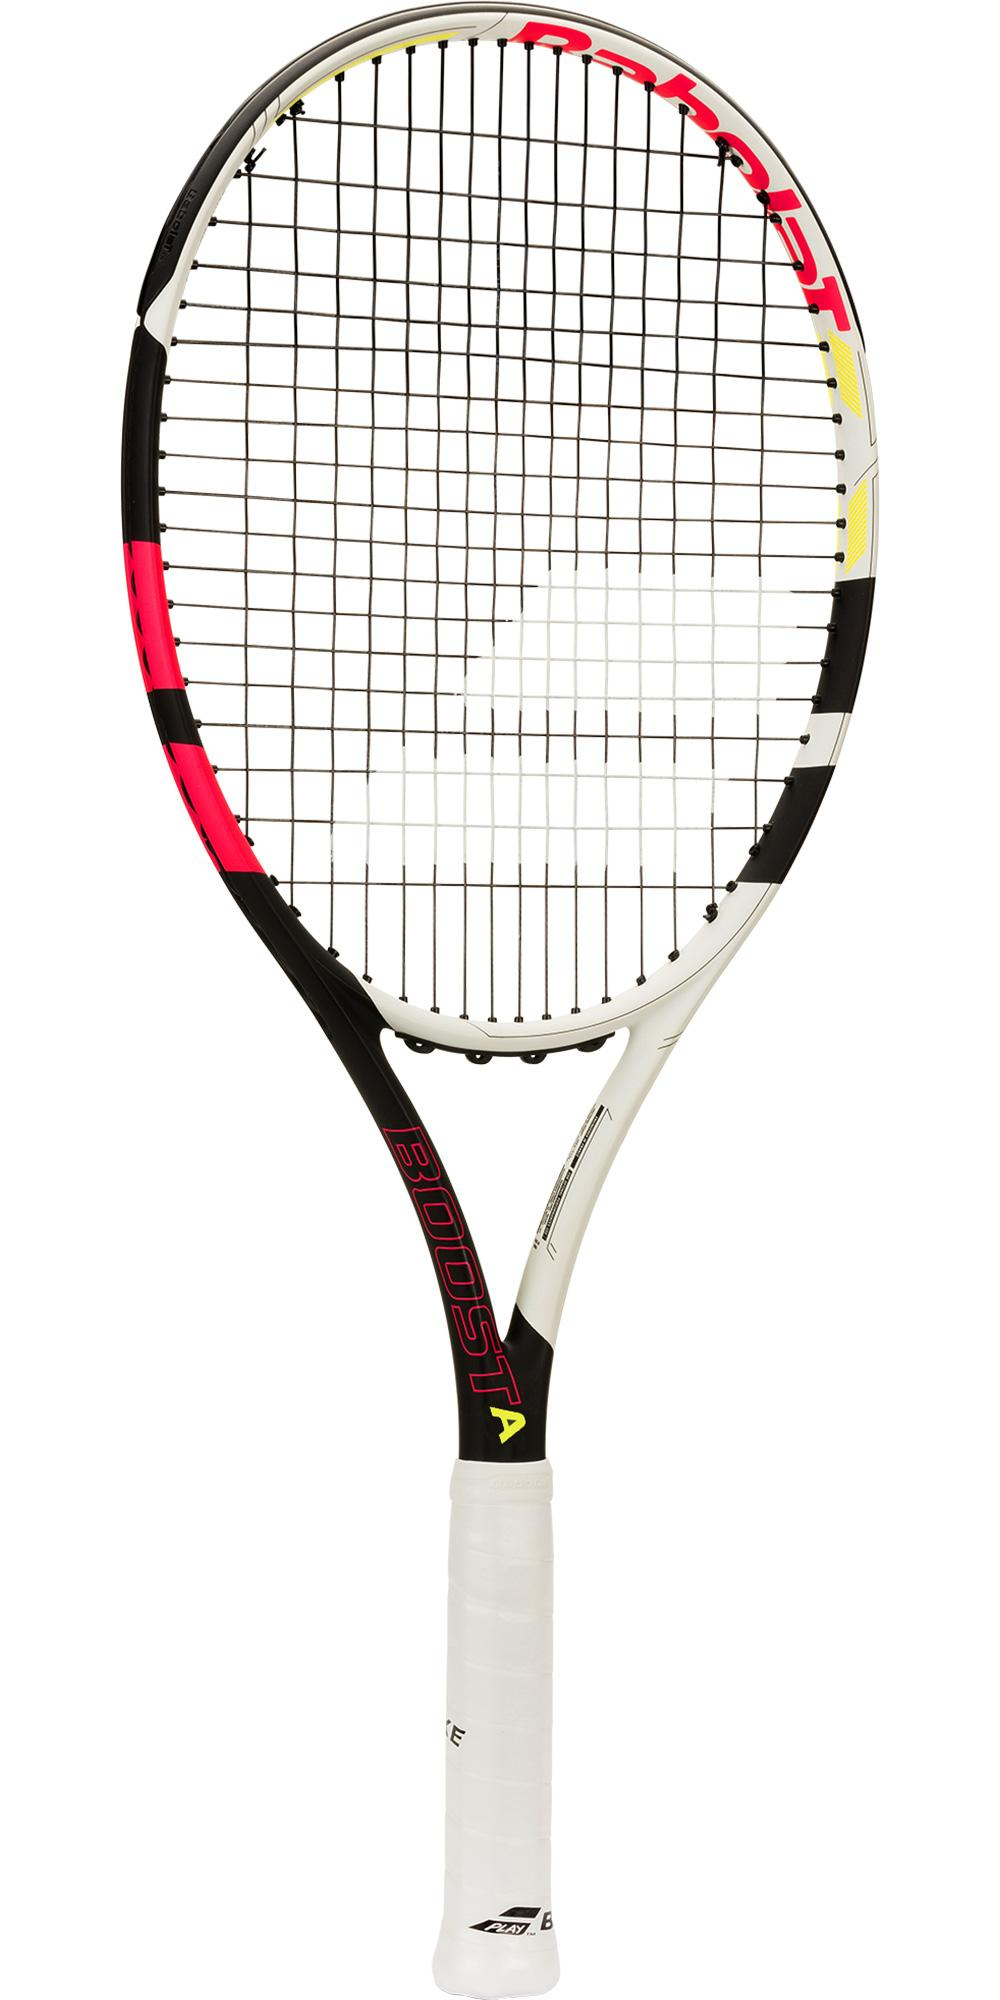 Babolat Boost Aero Tennis Racket - Black/Pink - Tennisnuts.com